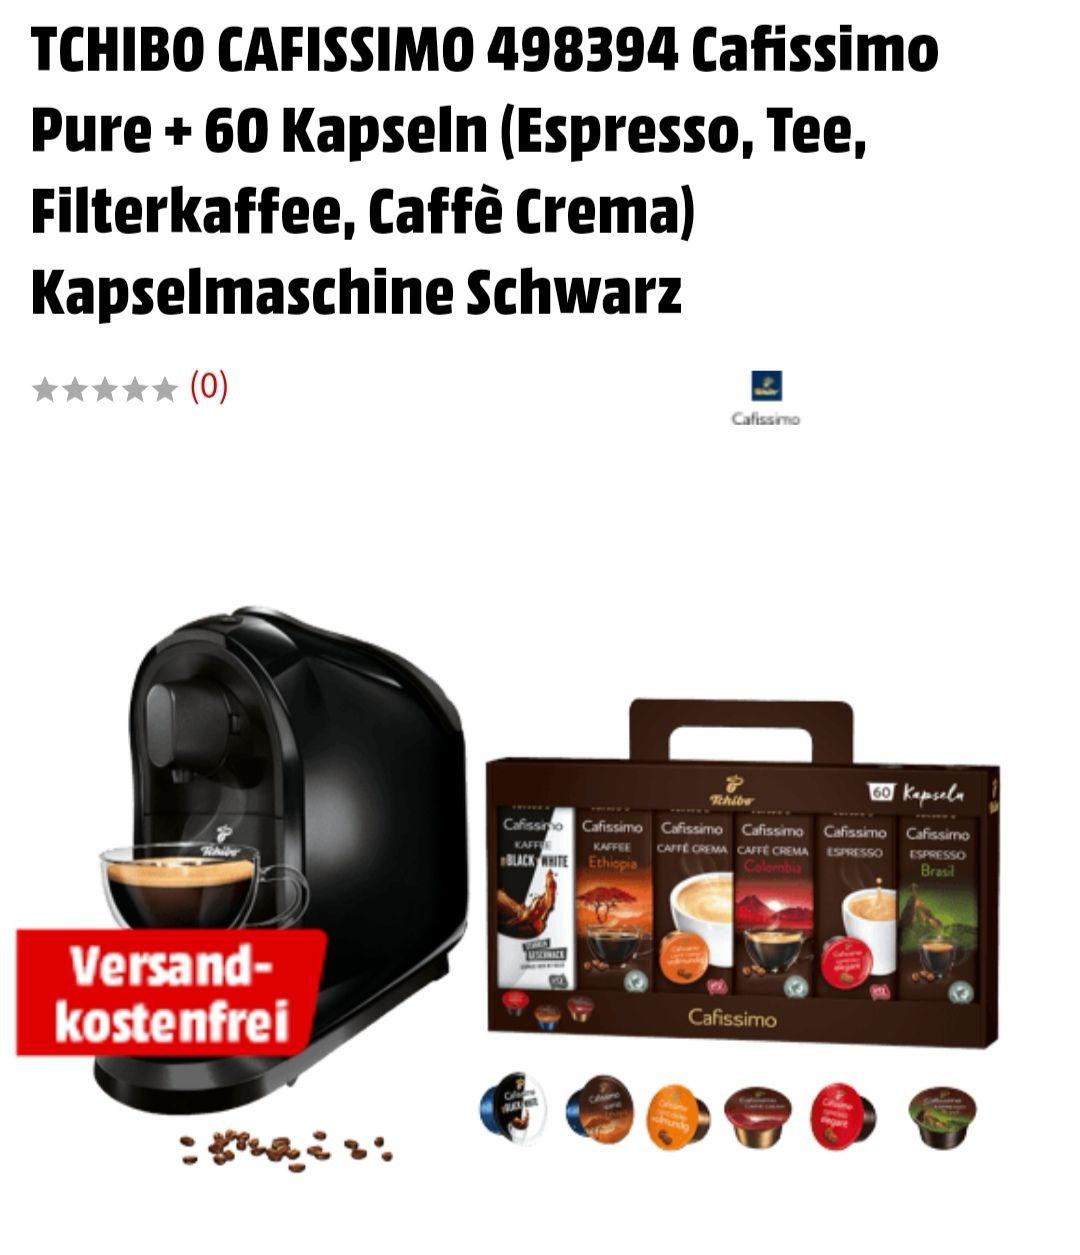 CAFISSIMO 498394 Cafissimo Pure + 60 Kapseln